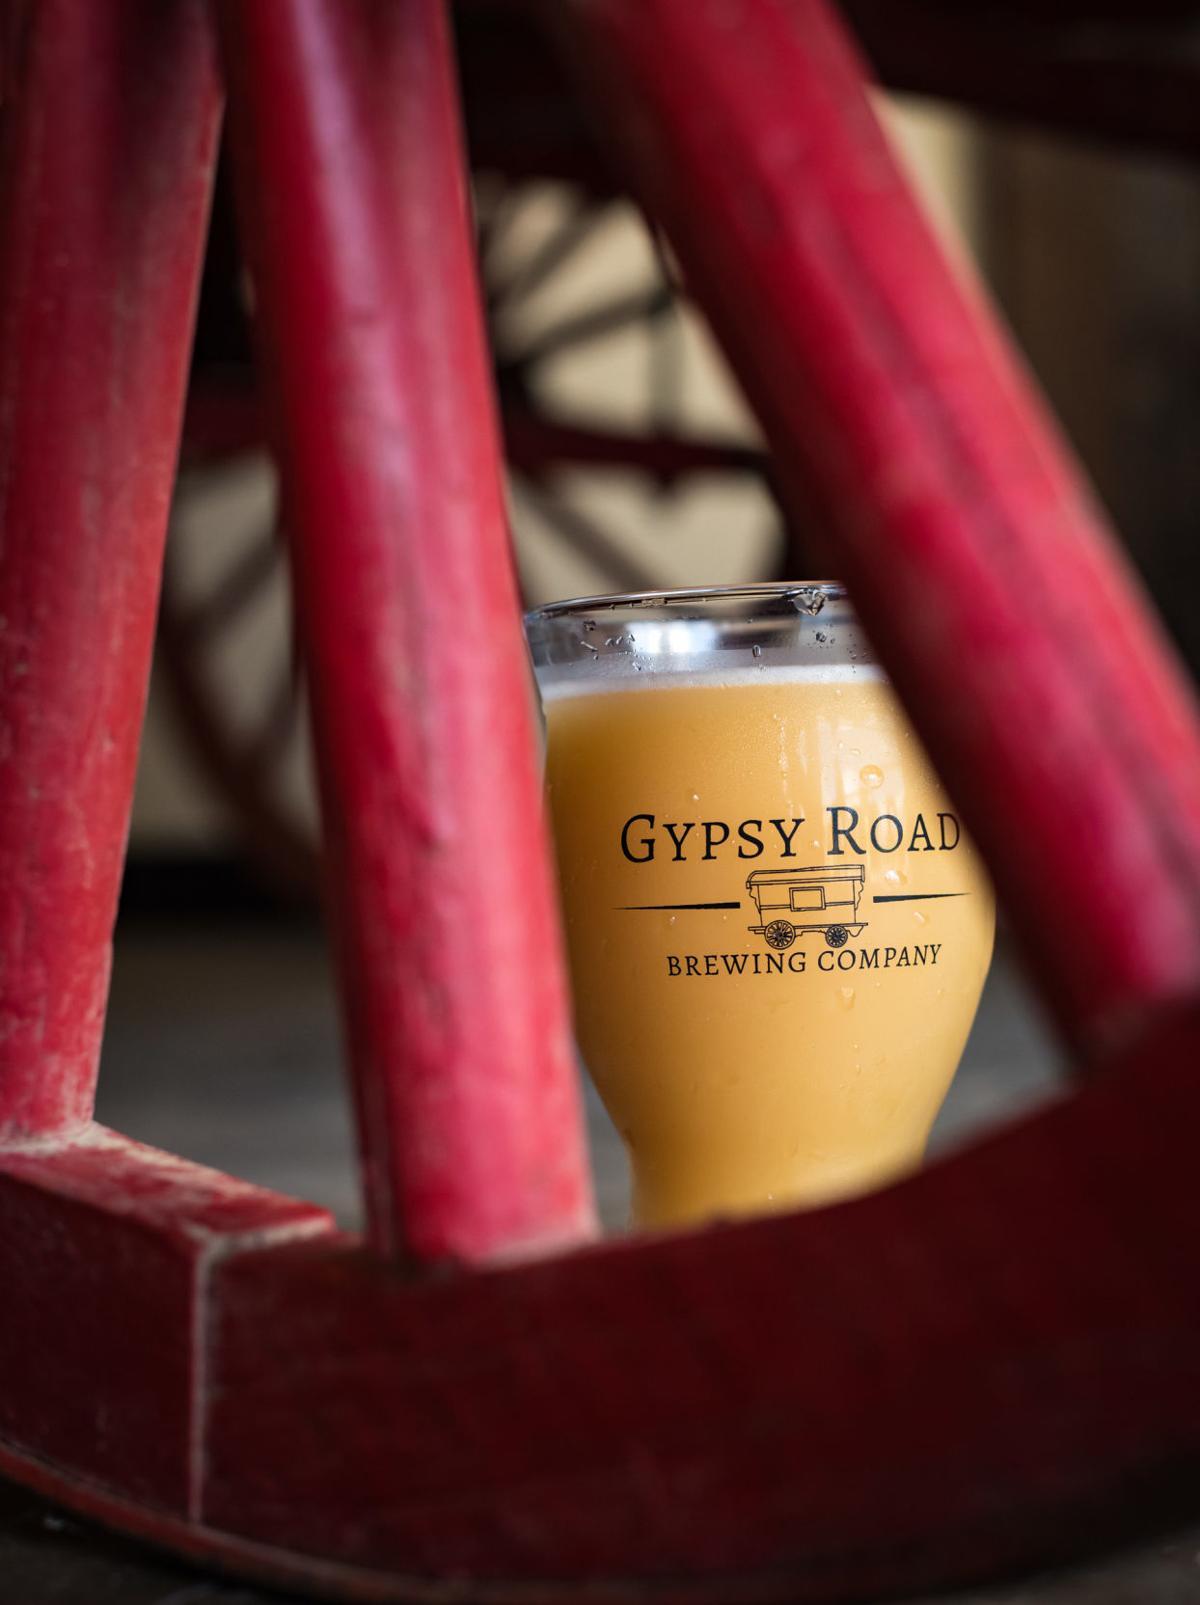 Gypsy Road Brewing Company